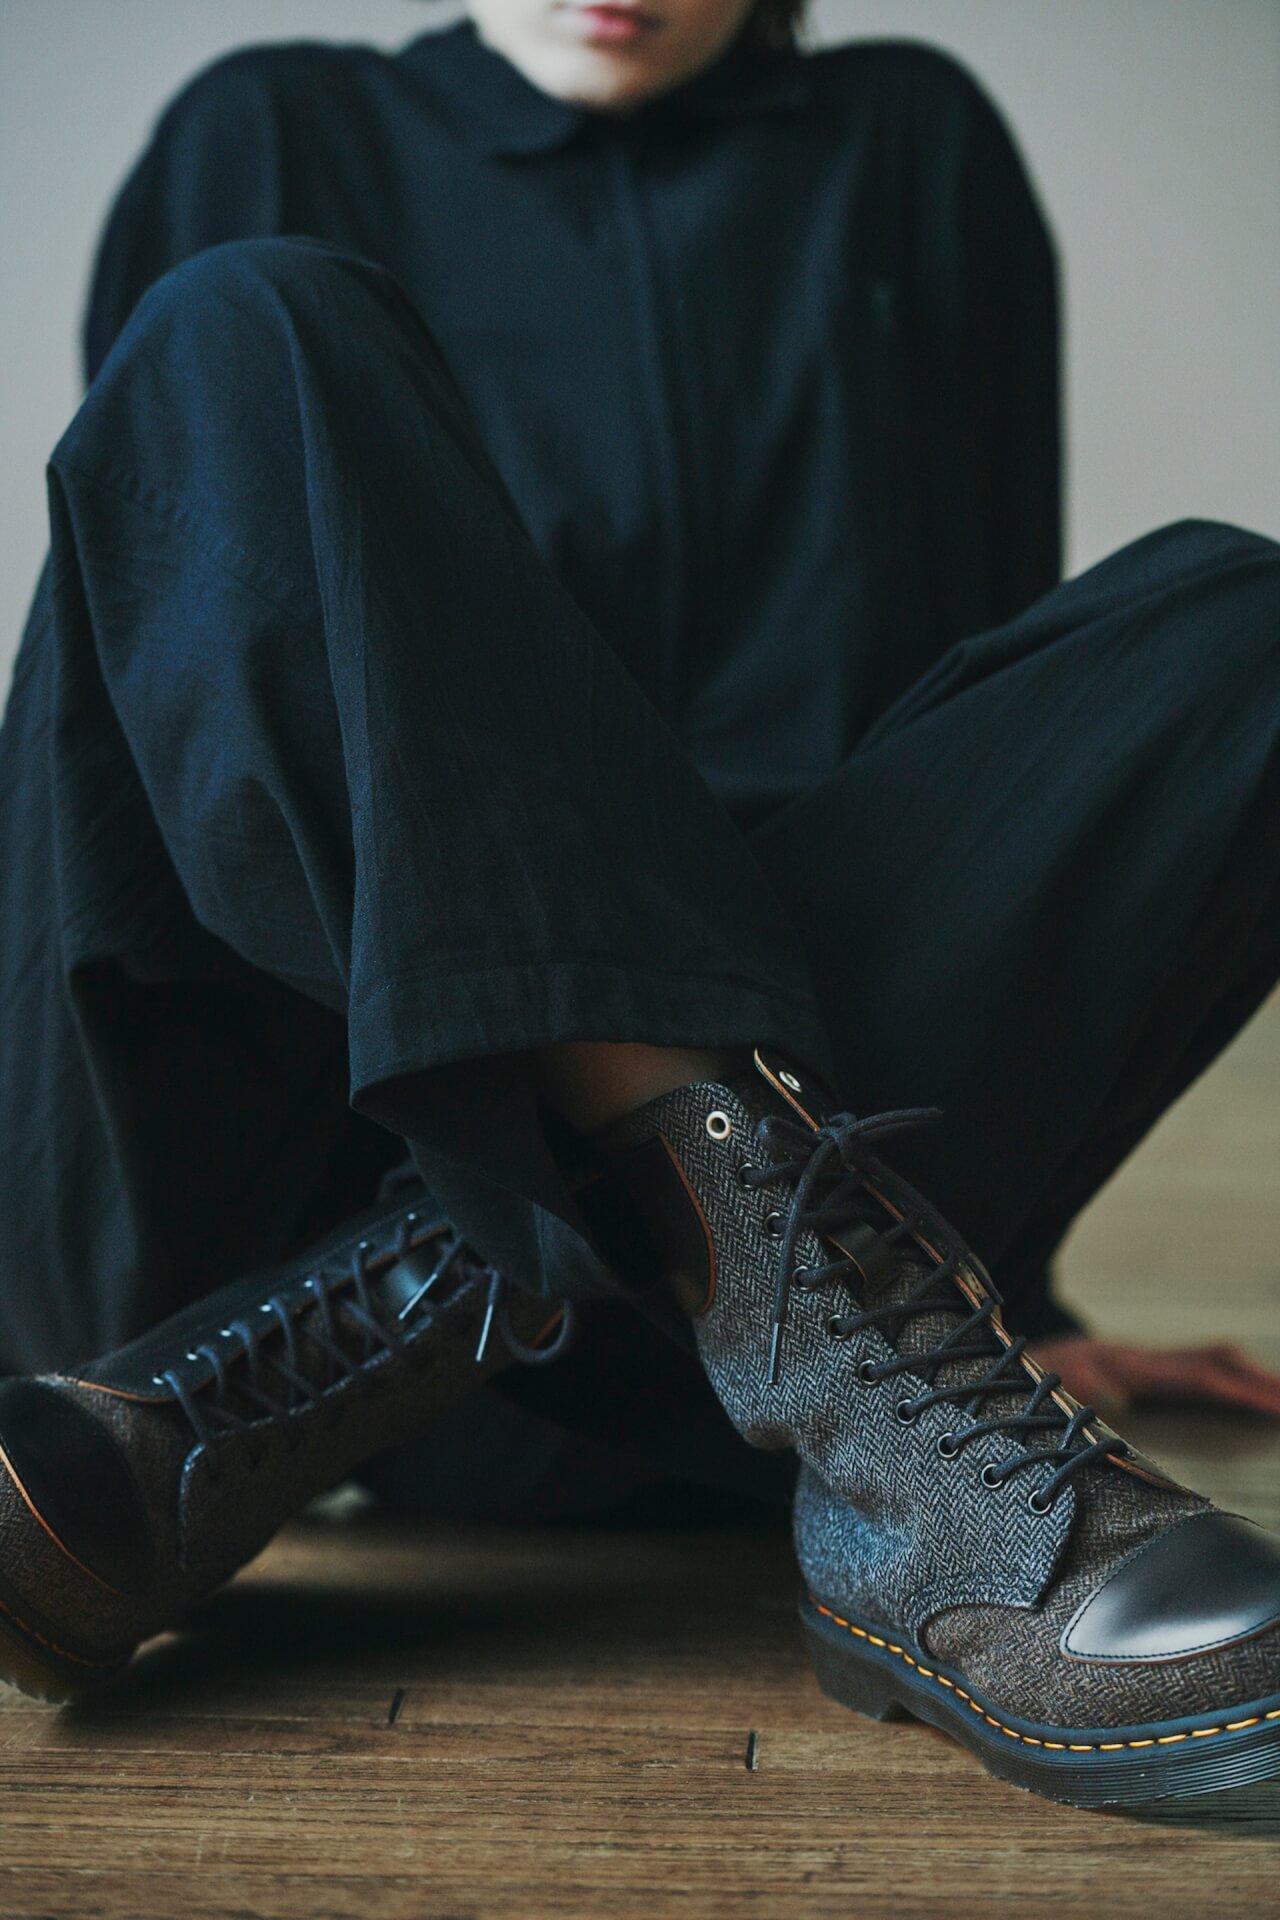 Y'sとドクターマーチンによる最新コレクション「Y's × Dr.Martens 10-EYE BOOT MOON FABRIC」が発売! 54fe8b2ef8f6781d6c7529ba9921cd26